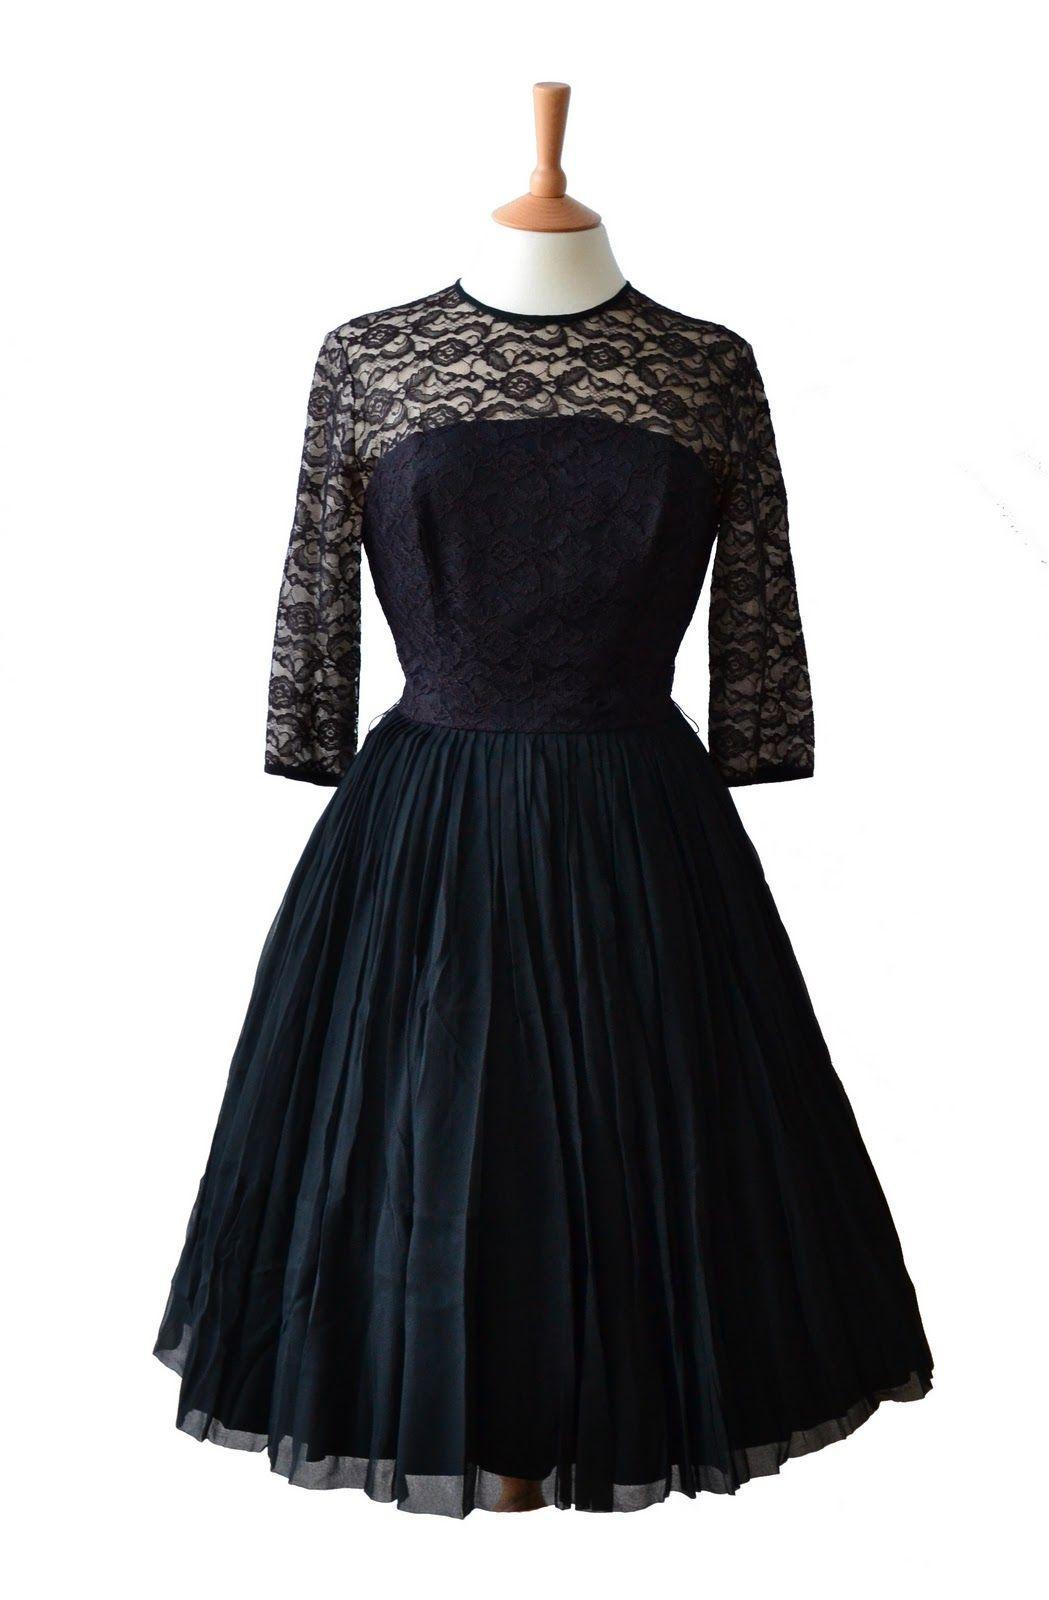 Vintage fashions vintage clothing company blog coming soon